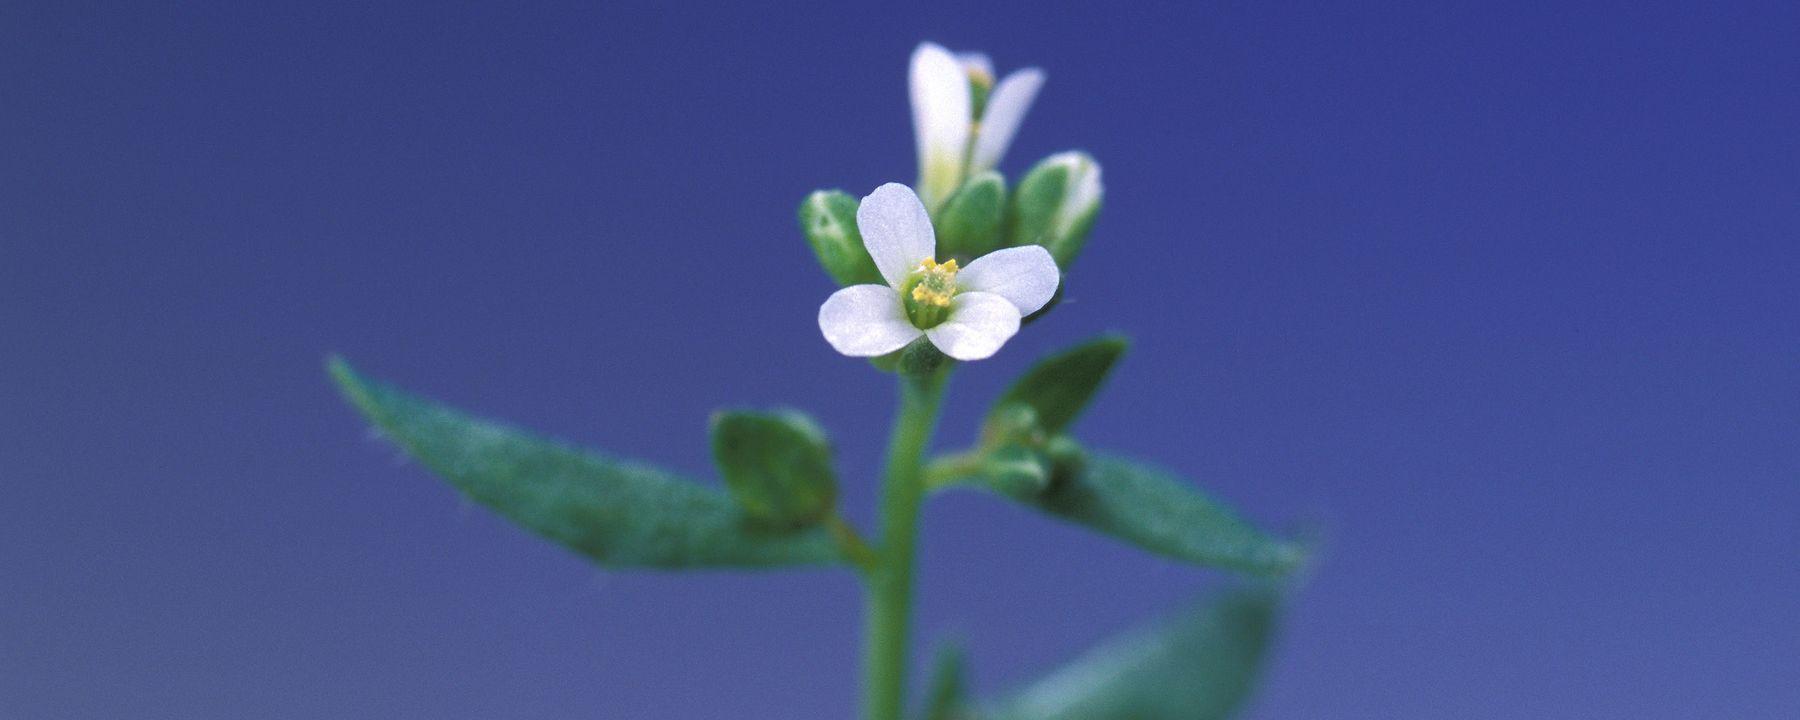 Plants Use RNA to Talk to Neighbors